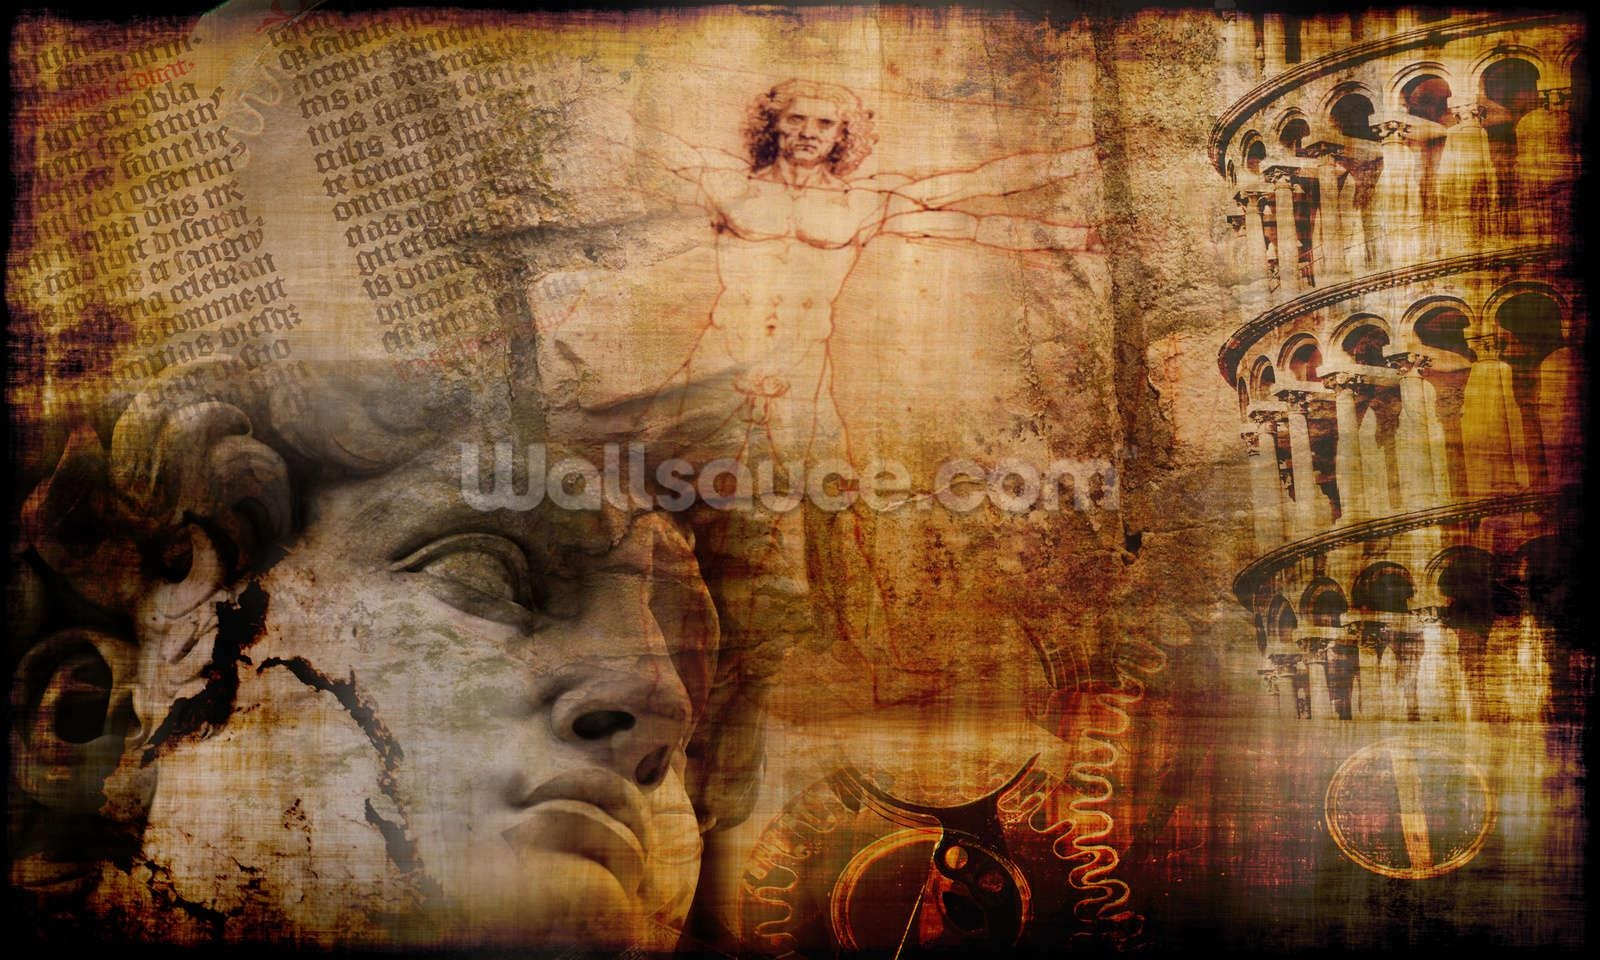 Vitruvian Man, Italian Icons Wallpaper Wall Mural | Wallsauce Usa Within Italian Art Wall Murals (View 3 of 20)